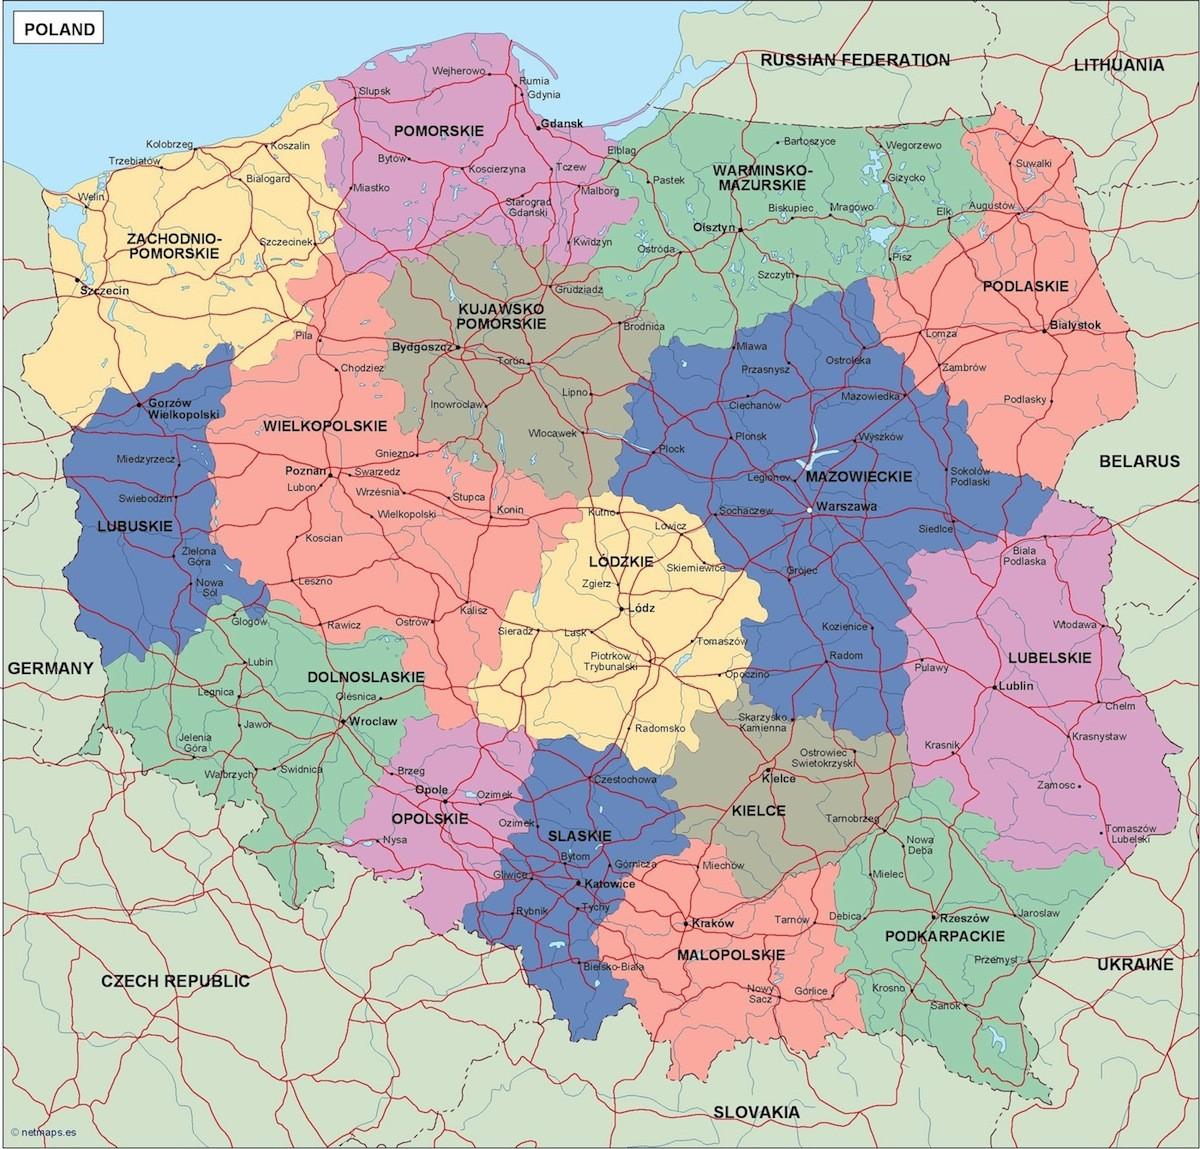 Poland Political Map Illustrator Vector Eps Maps Eps Illustrator - Poland political map